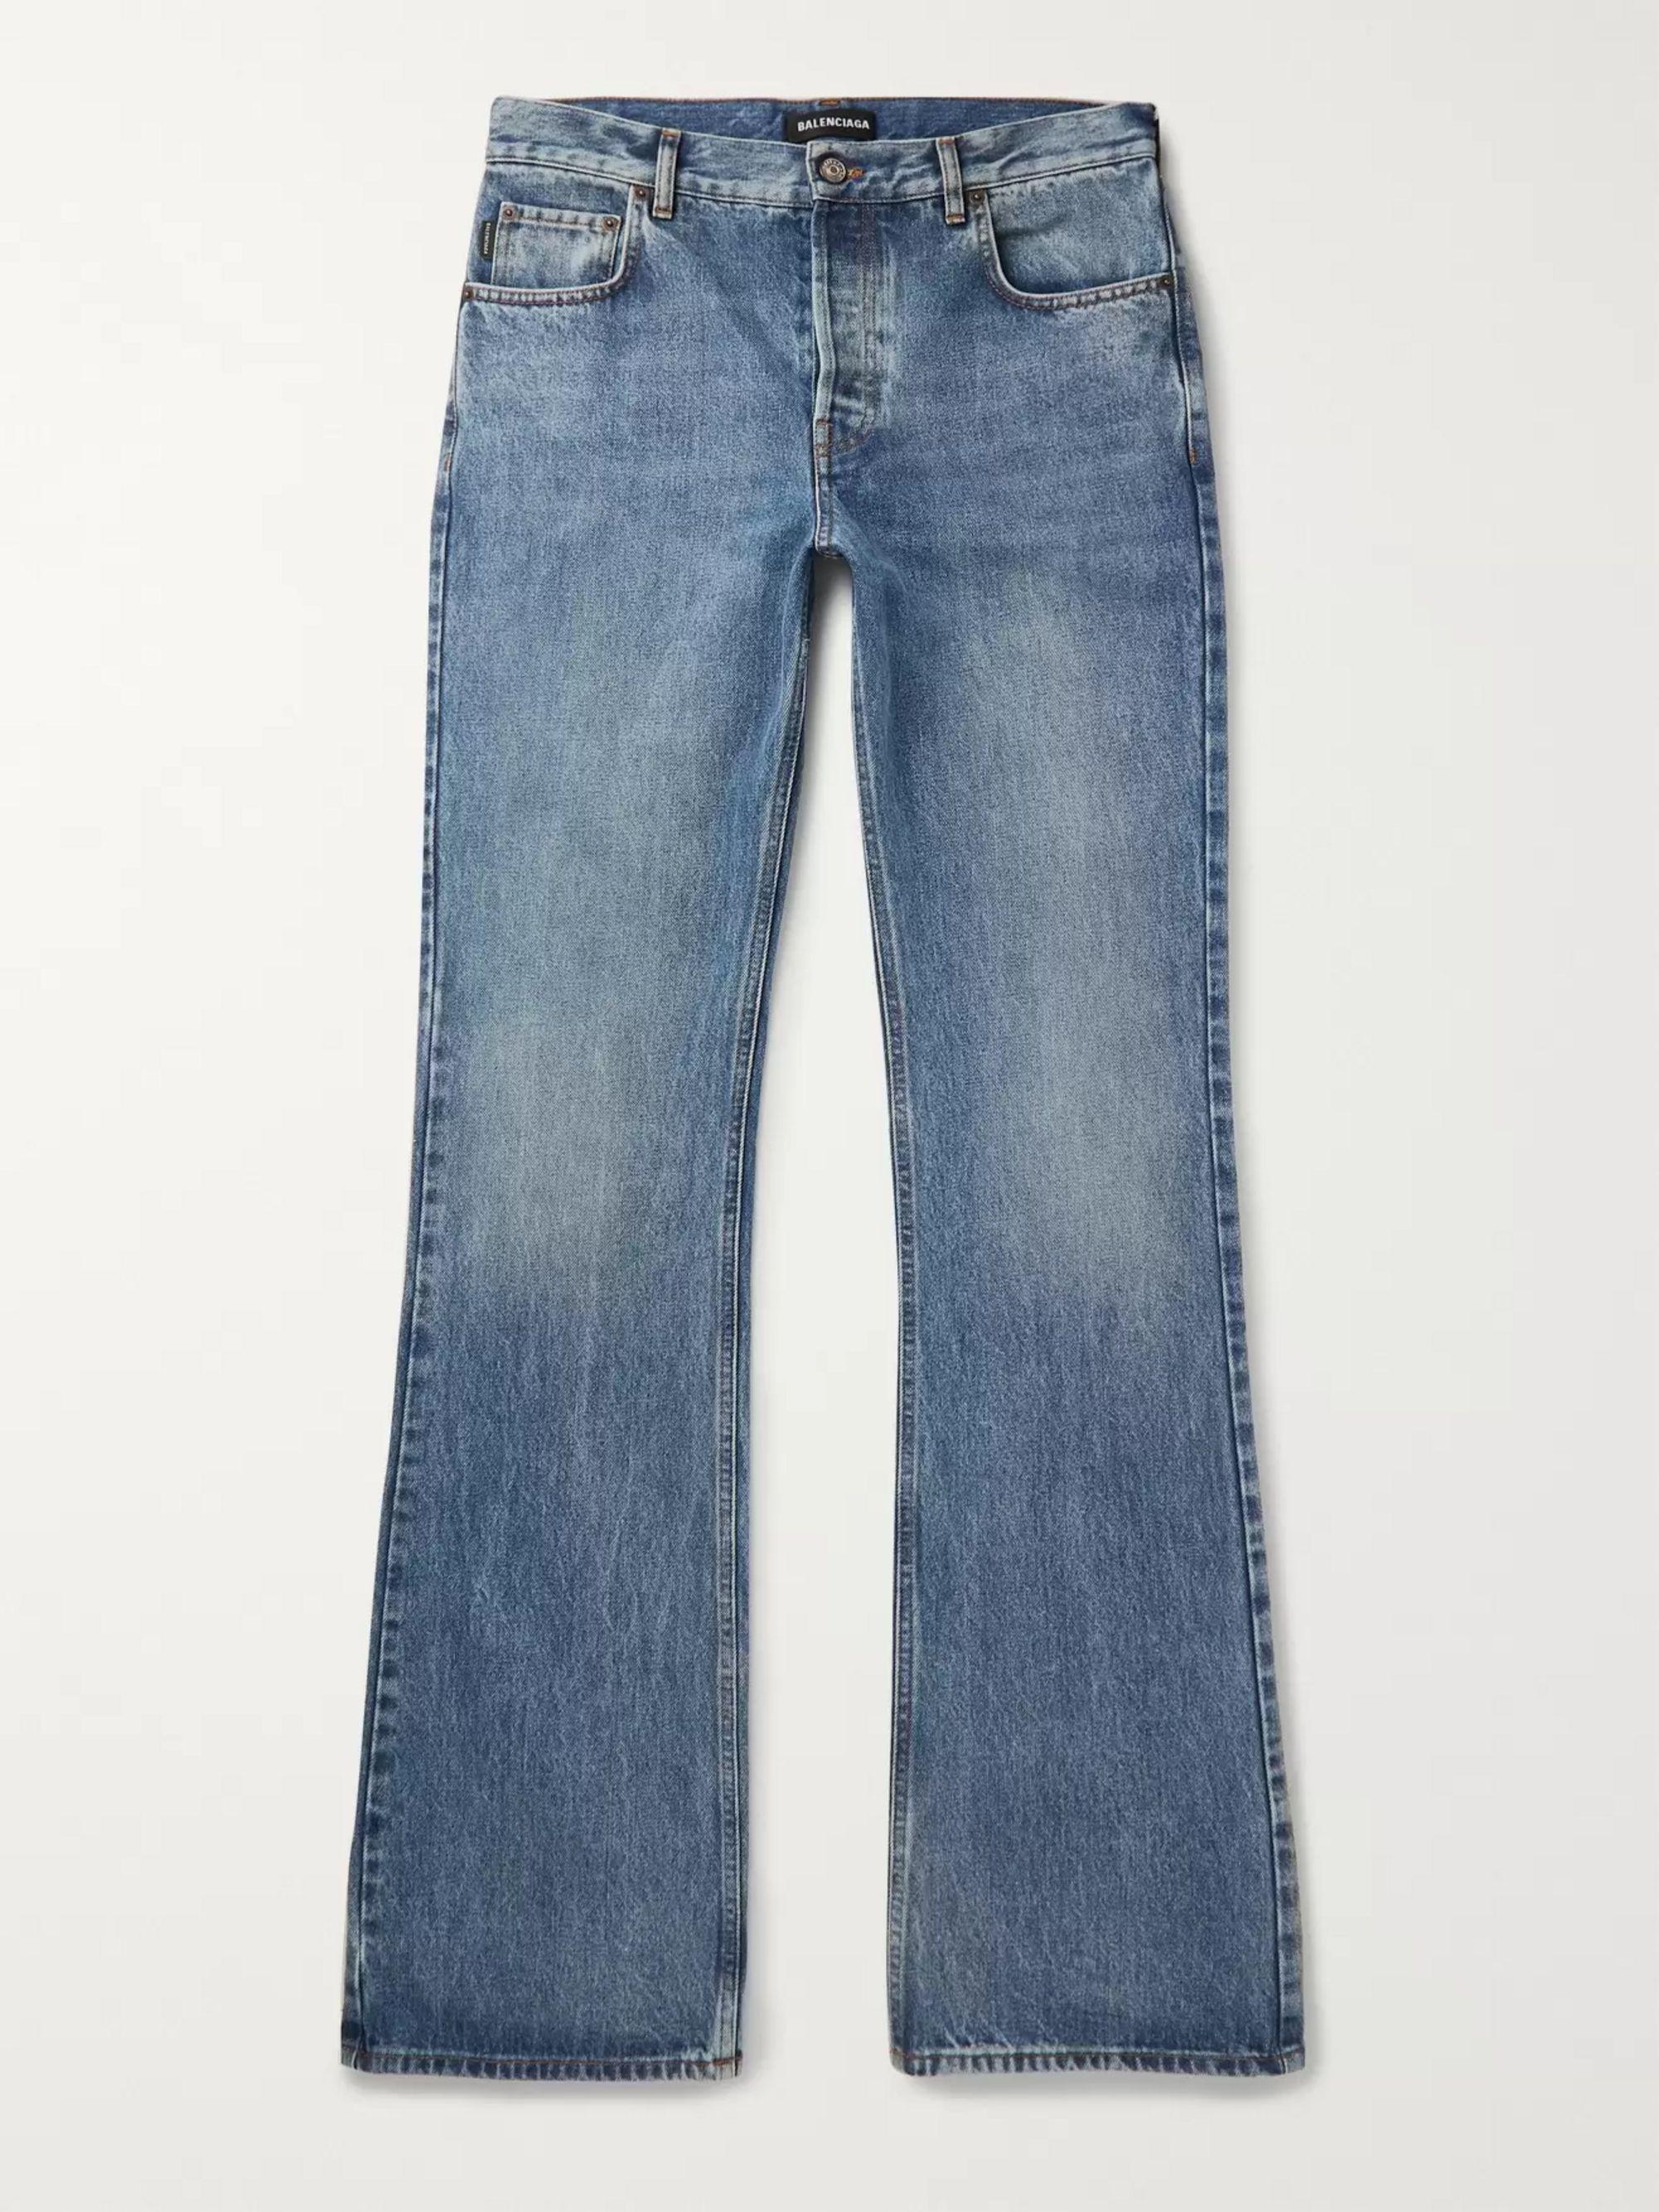 free shipping 27769 97467 Denim Jeans